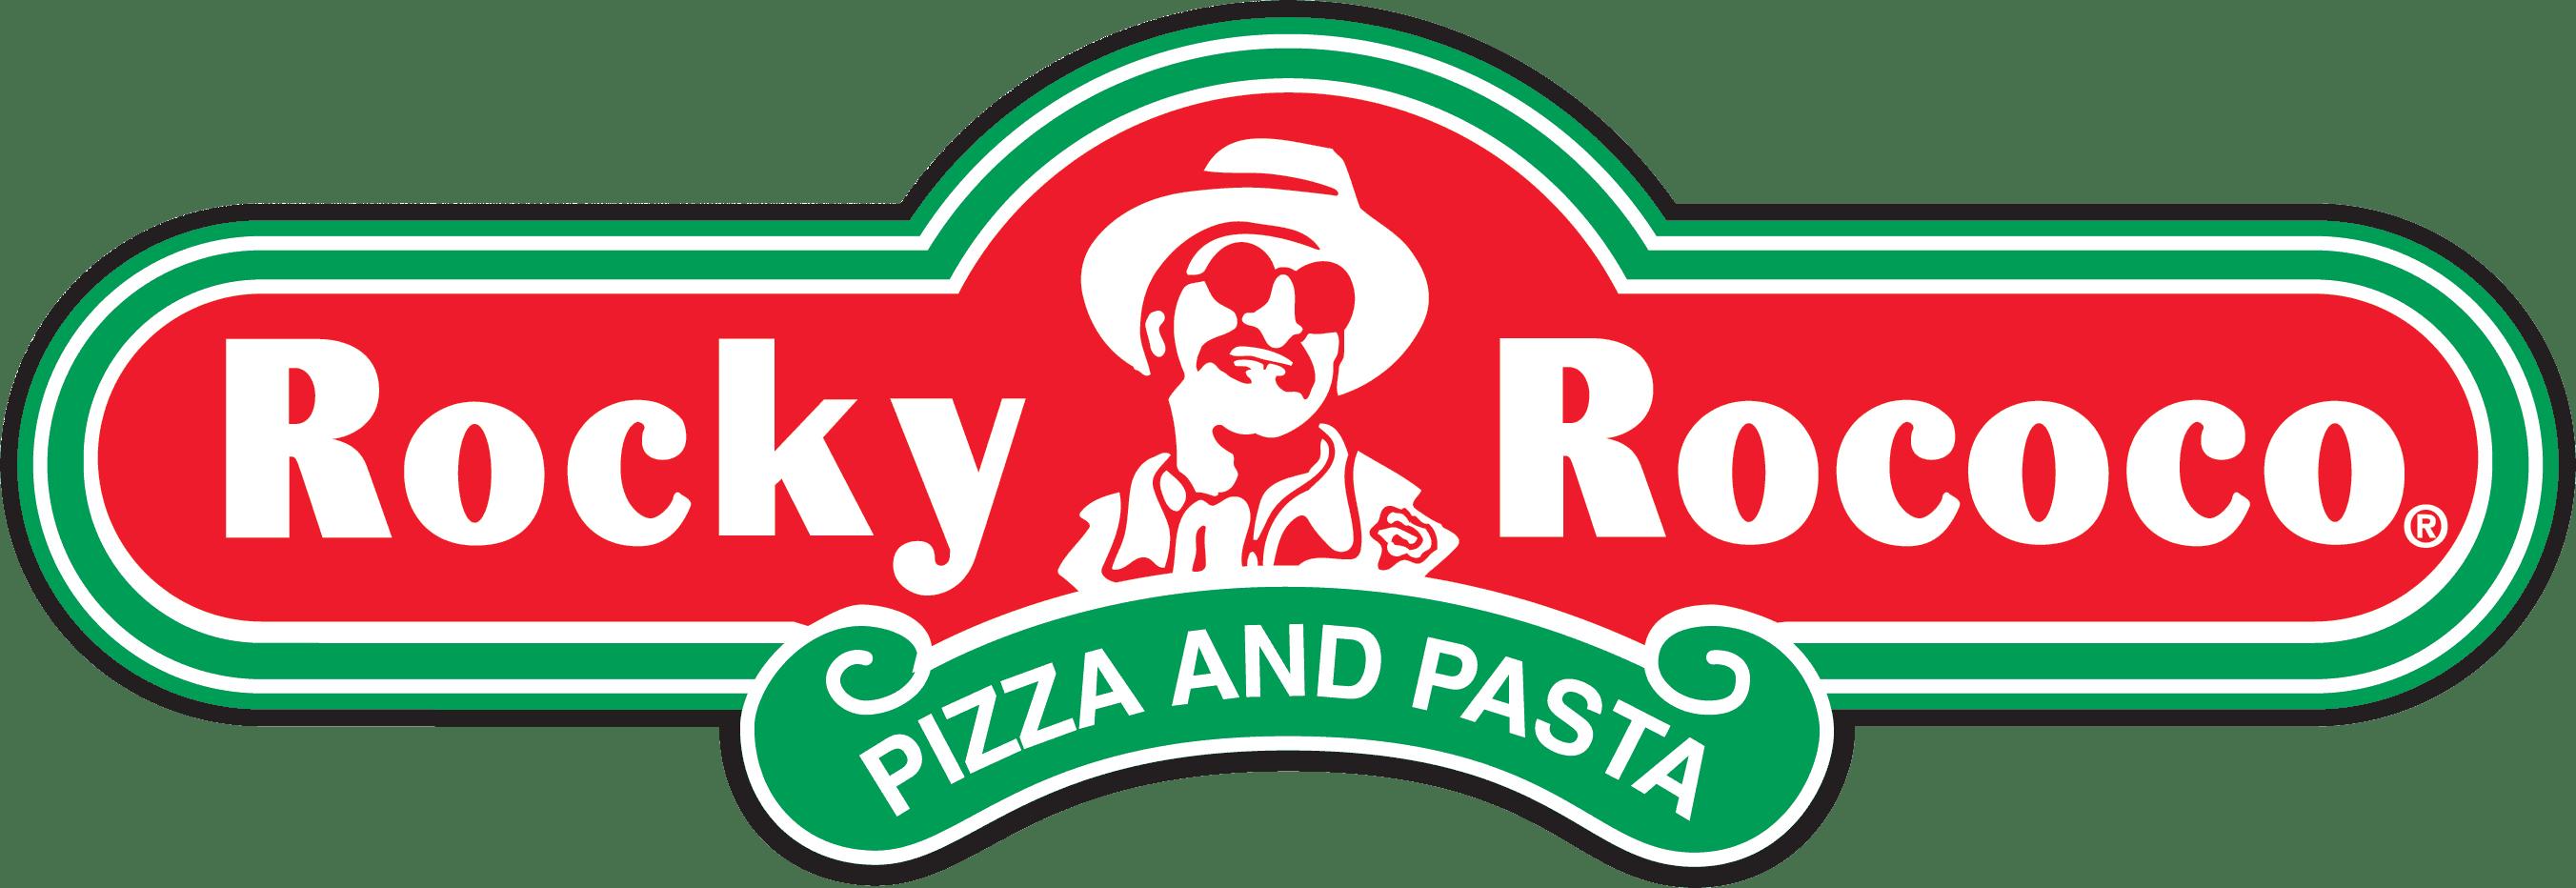 Rocky Rococo - Waunakee Logo